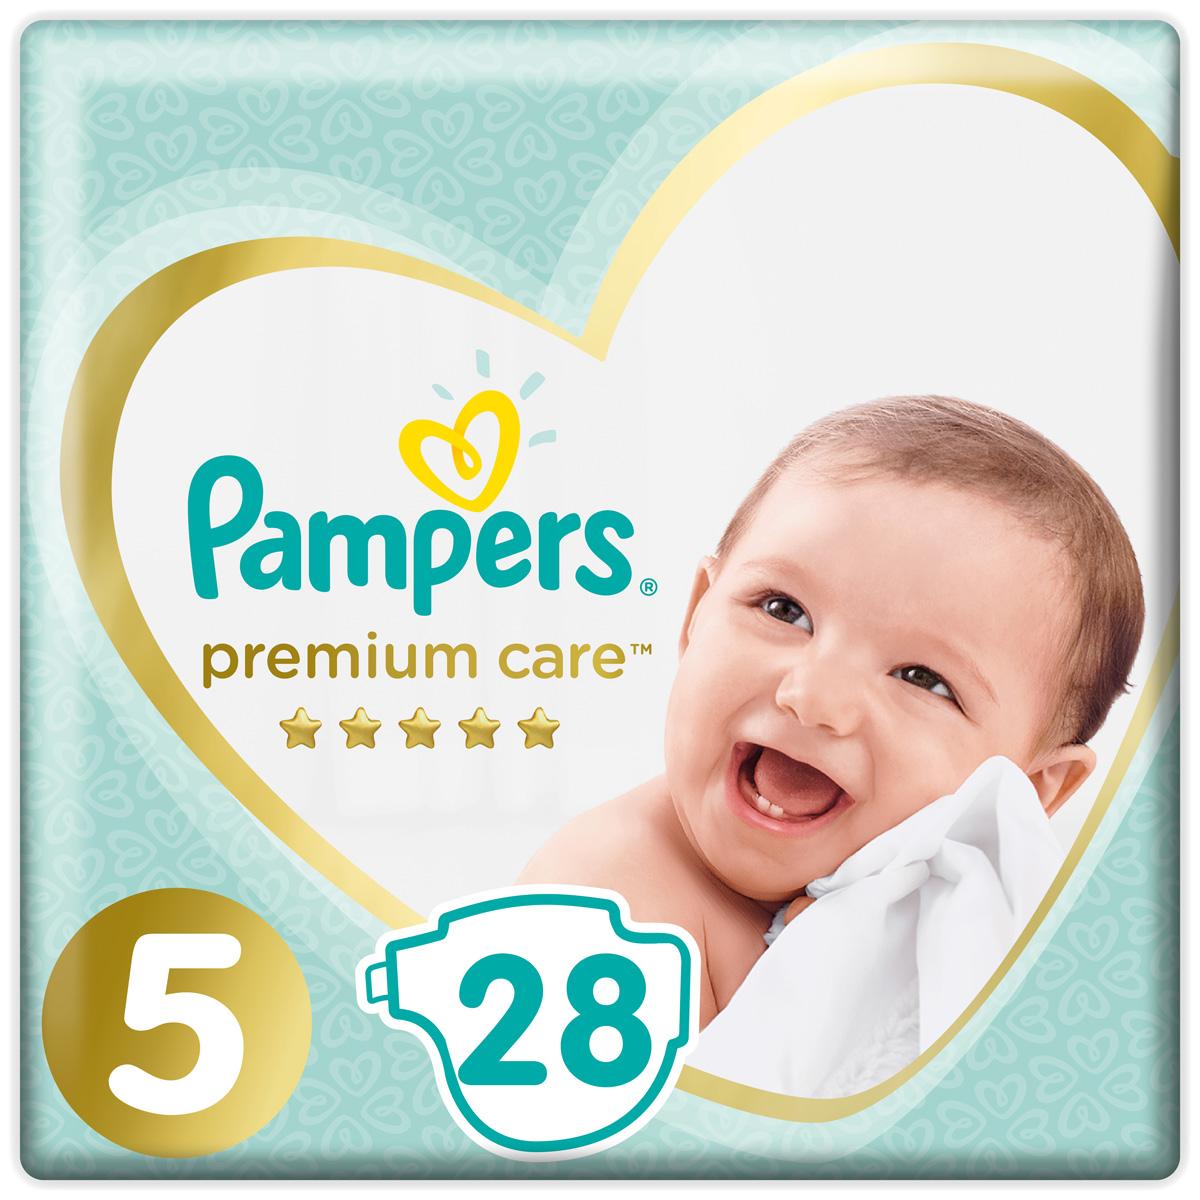 Pampers Подгузники Premium Care 11+ кг (размер 5) 28 шт подгузники pampers premium care 5 11 кг 42 шт